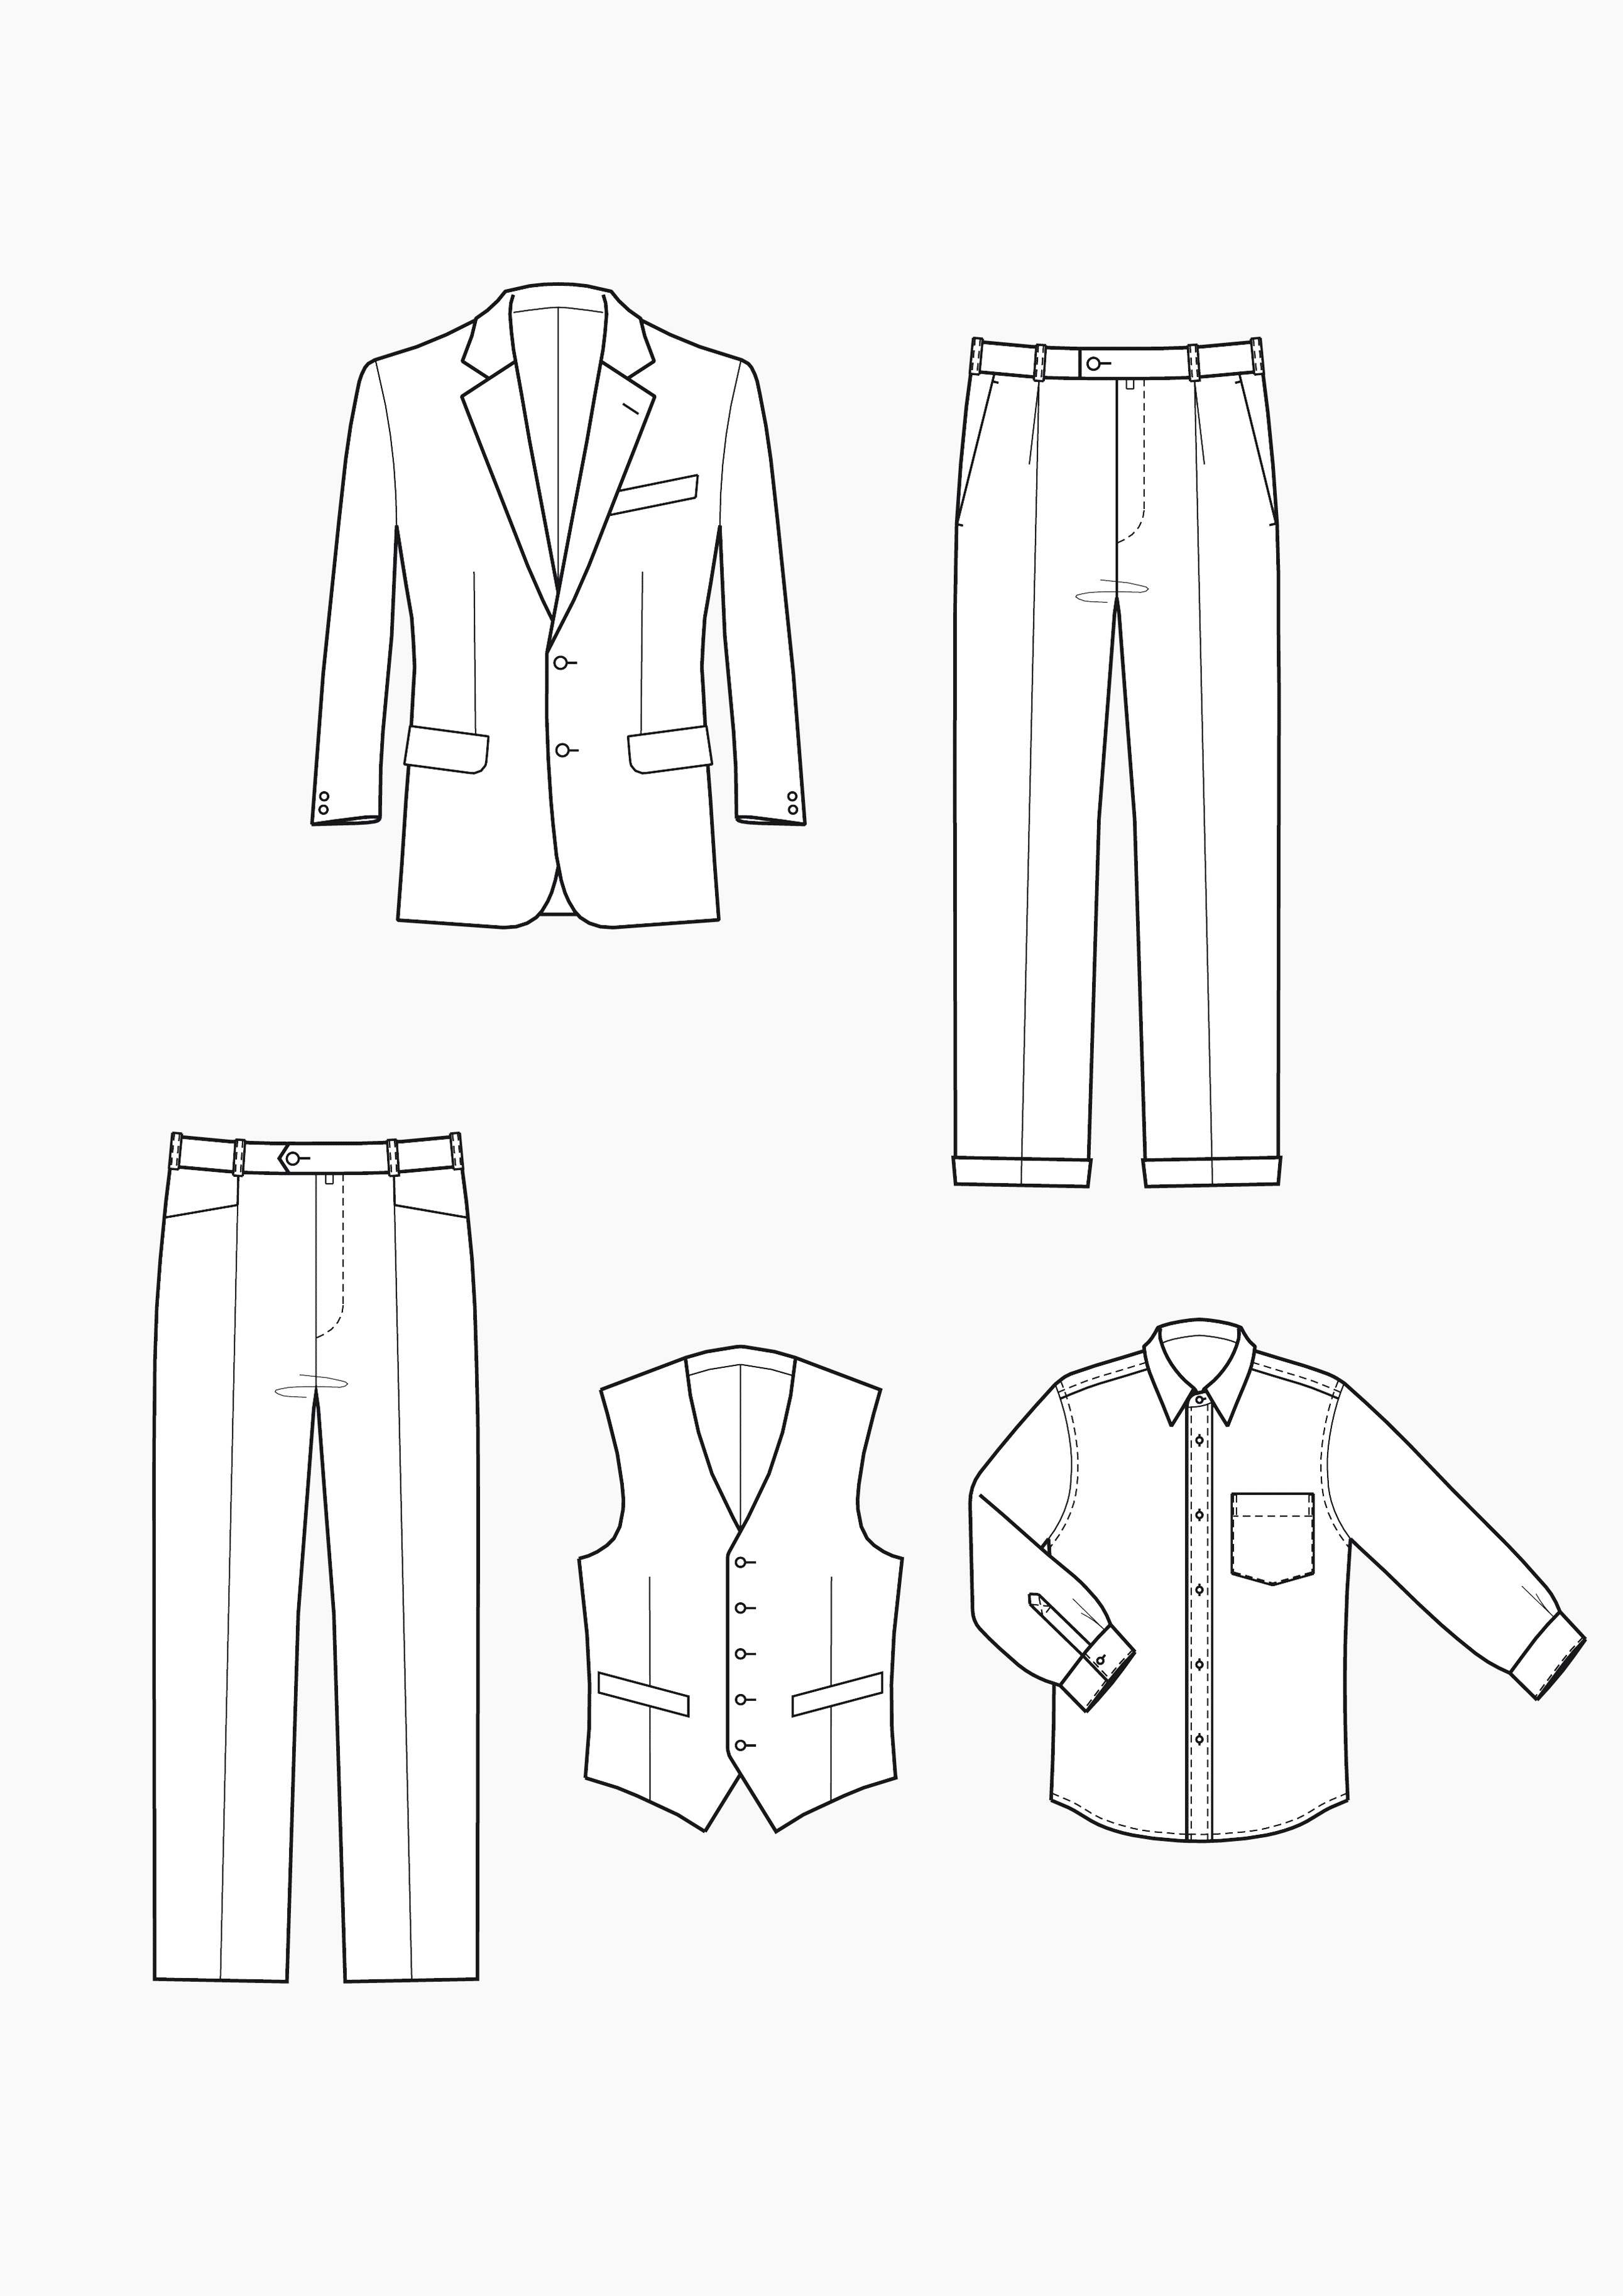 Produkt: Schnitt-Technik Anzug für Jungen